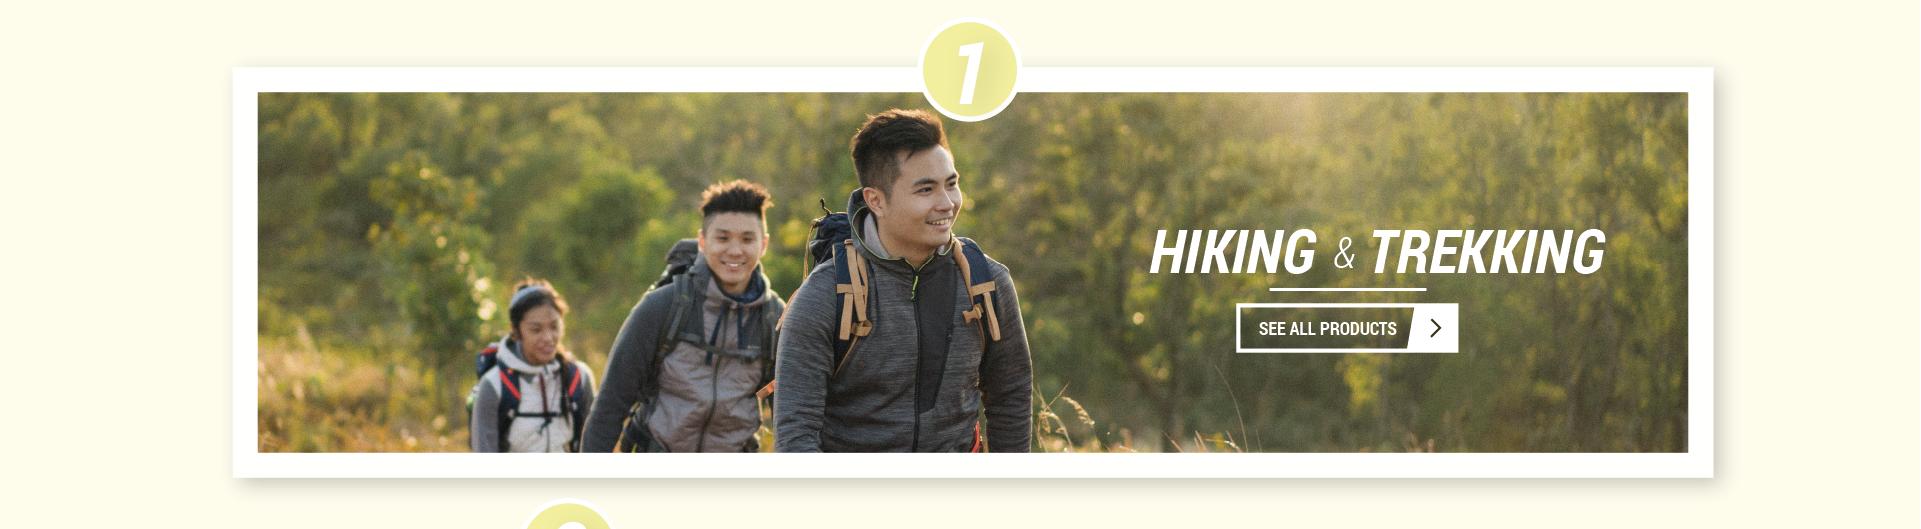 Best Sport - Hiking